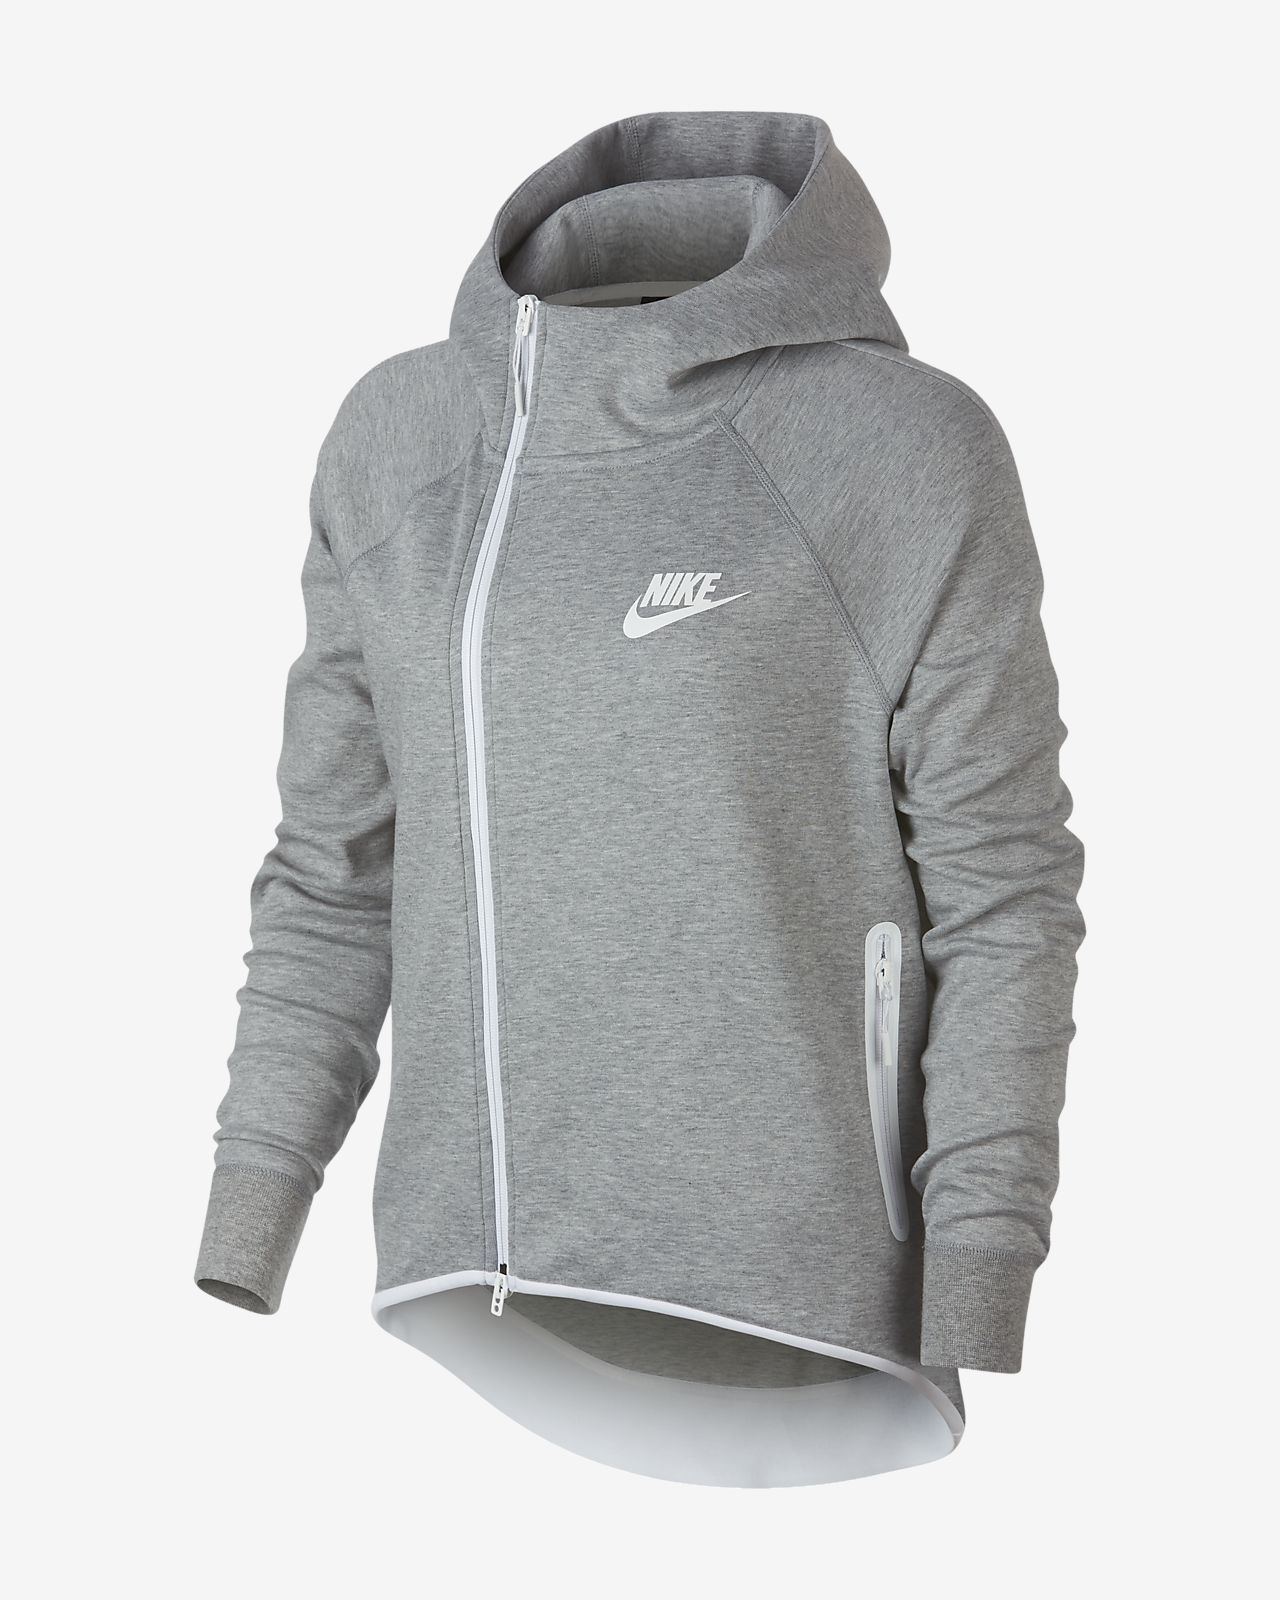 Nike Sportswear Tech Fleece Damen Poncho mit durchgehendem Reißverschluss